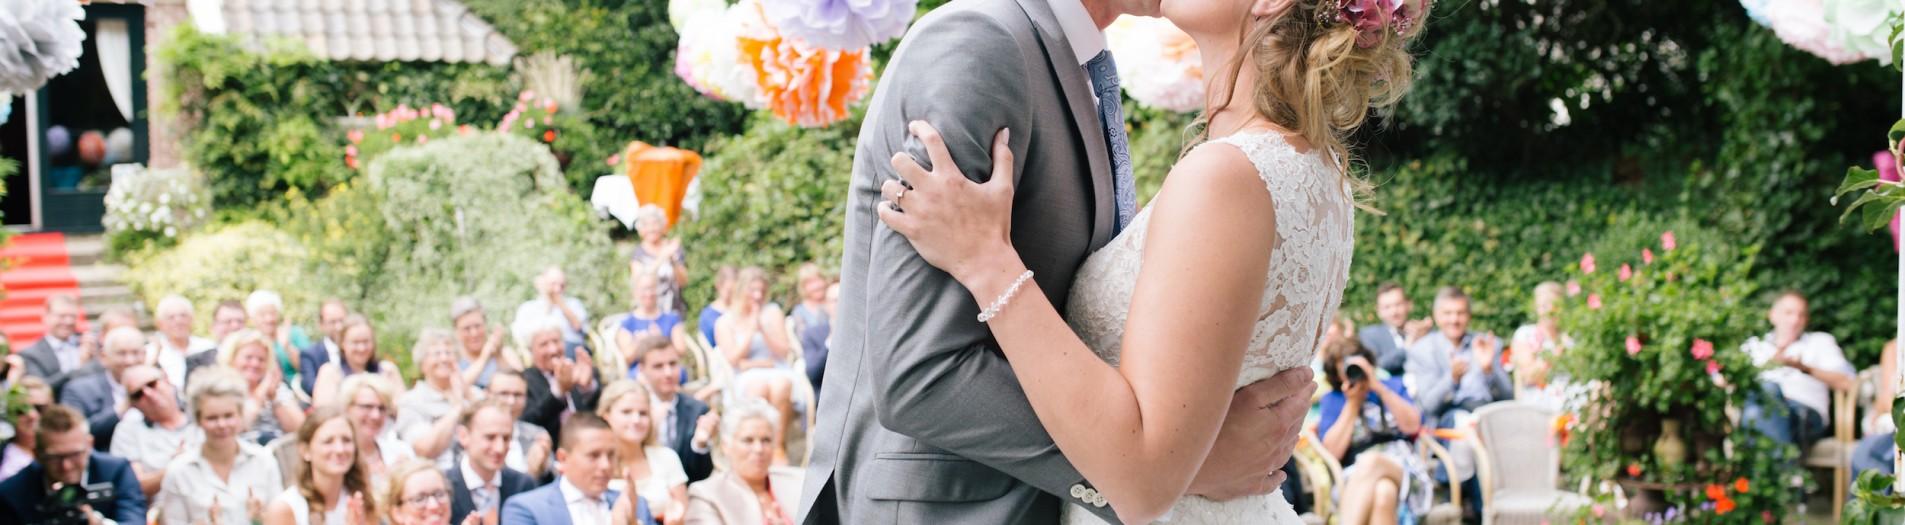 Bruiloft Alex en Marjolein